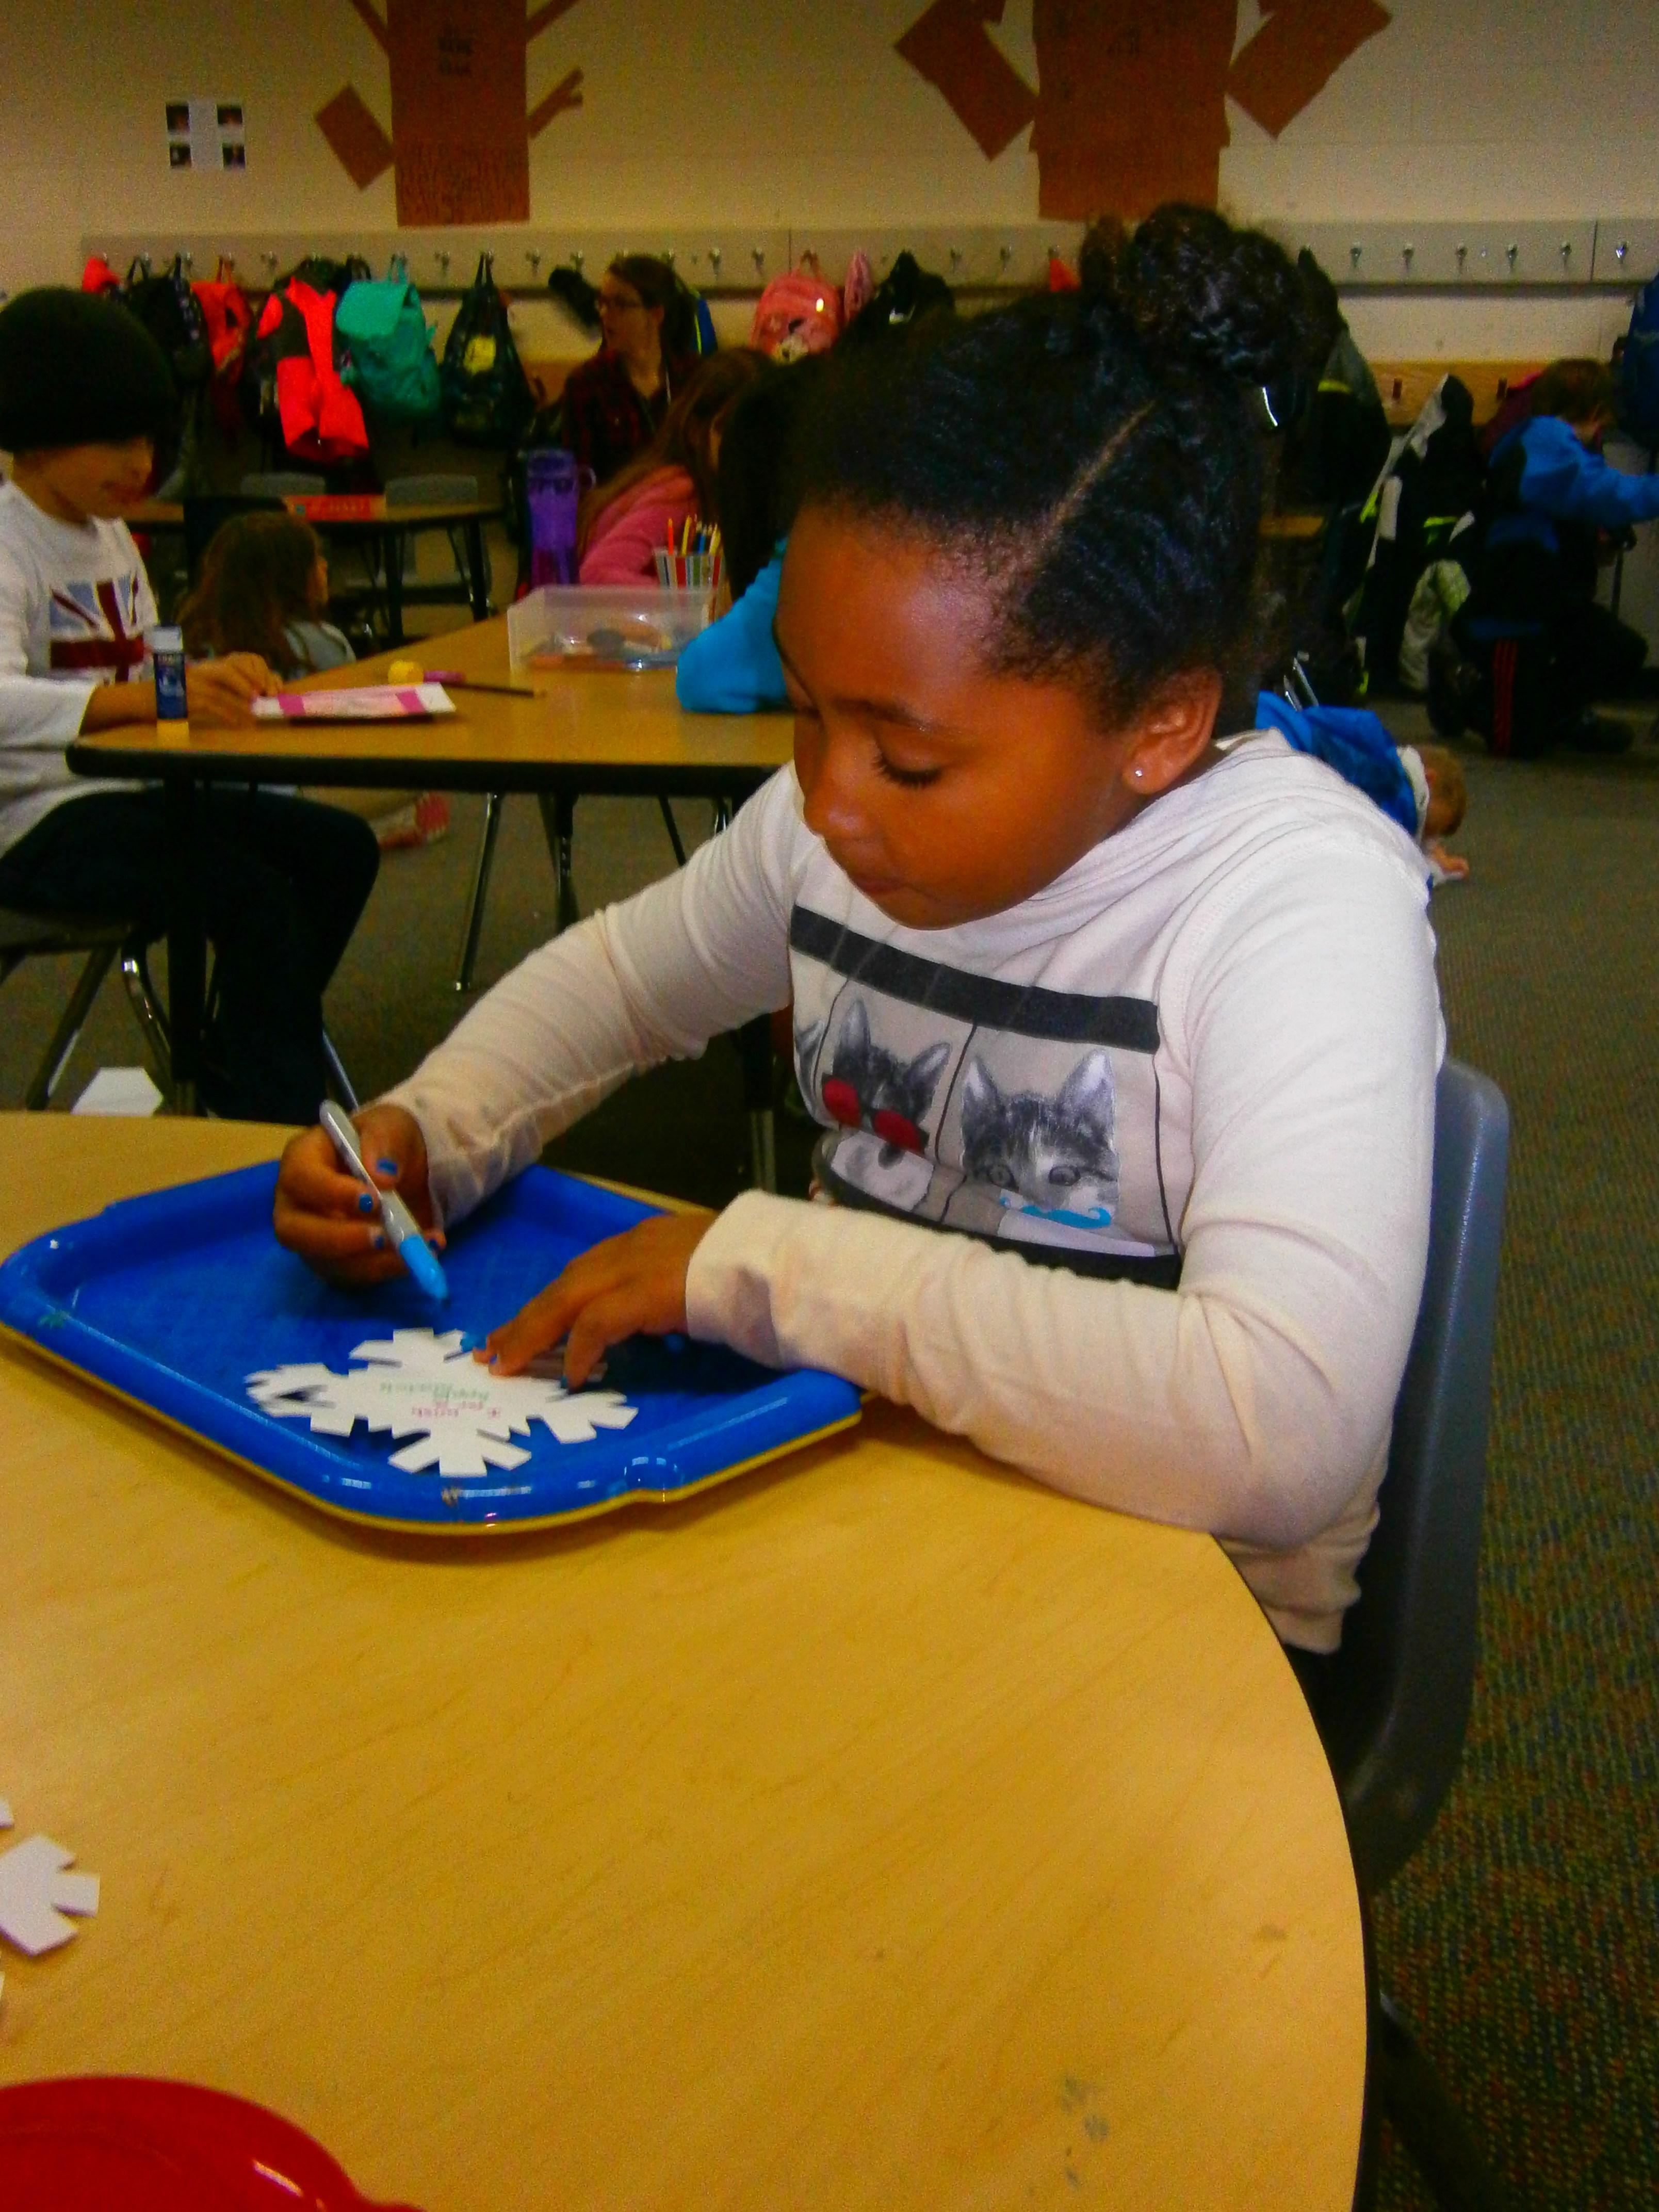 Decorating a snowflake.